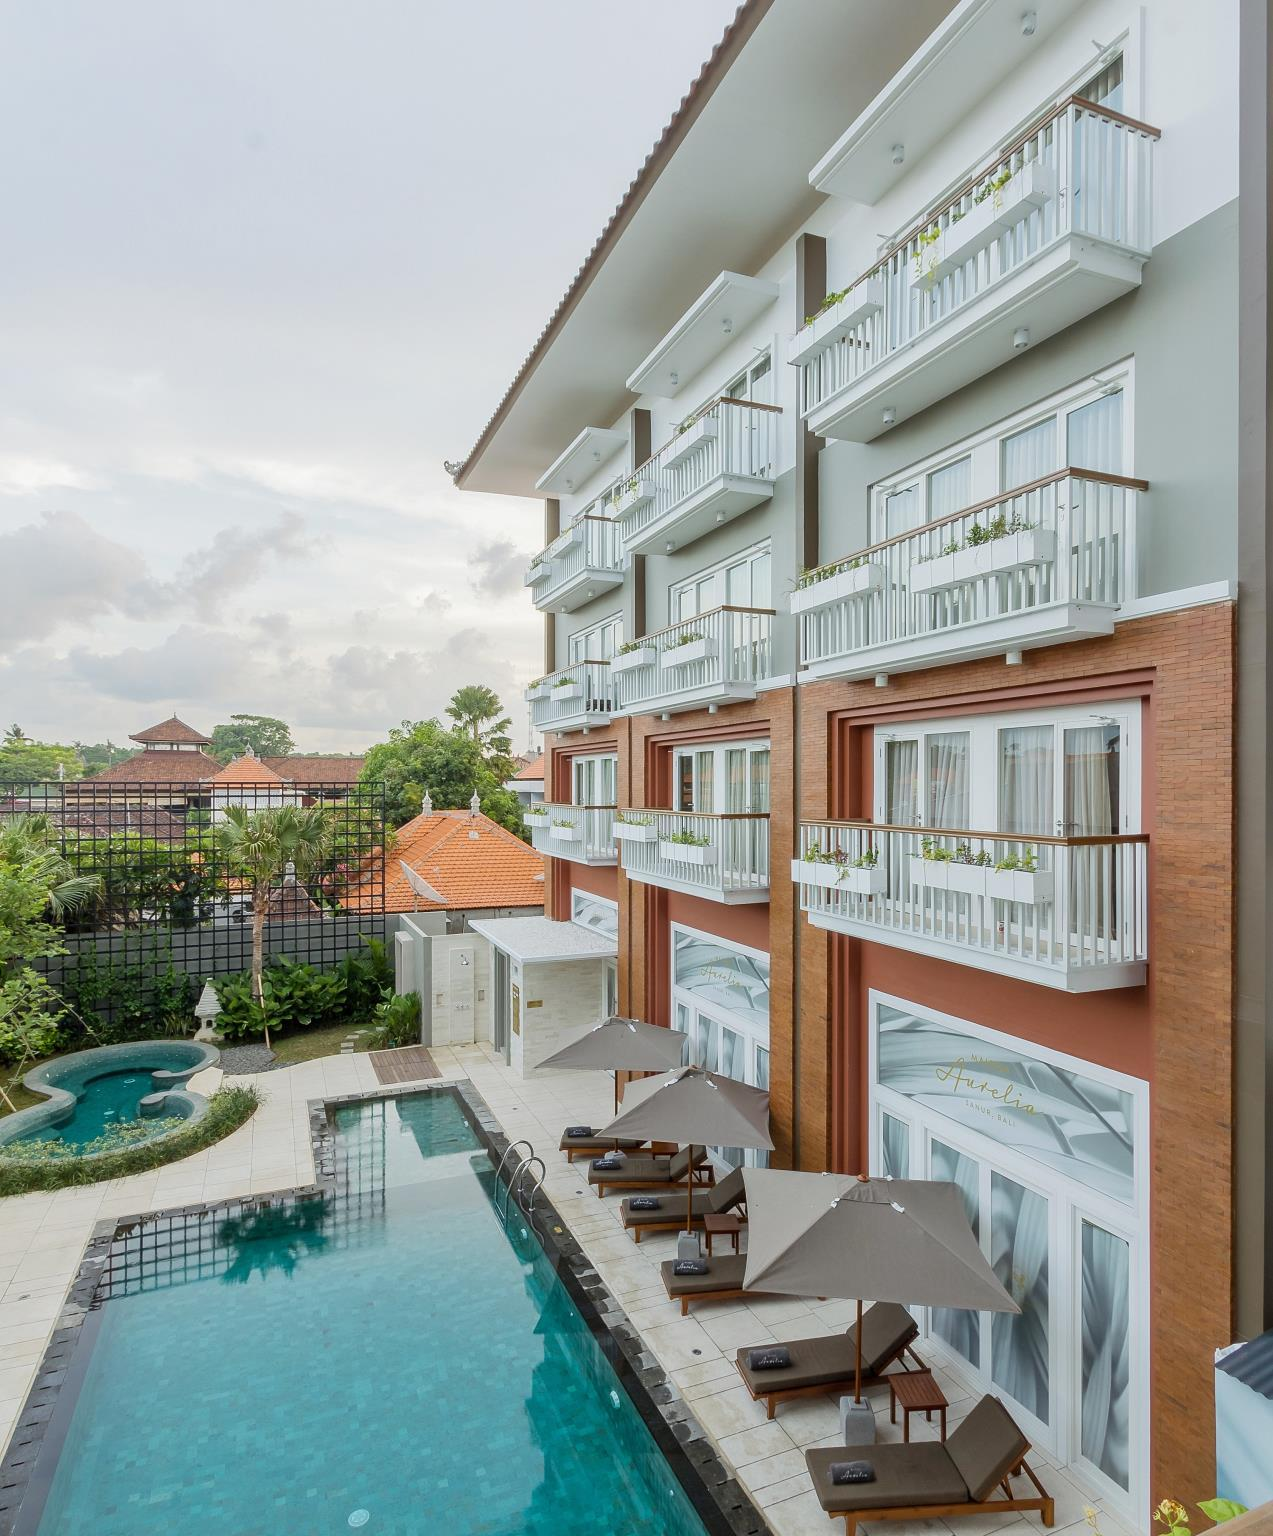 Elegant More About Maison Aurelia Sanur Bali By Preference With Maison Bali  Location